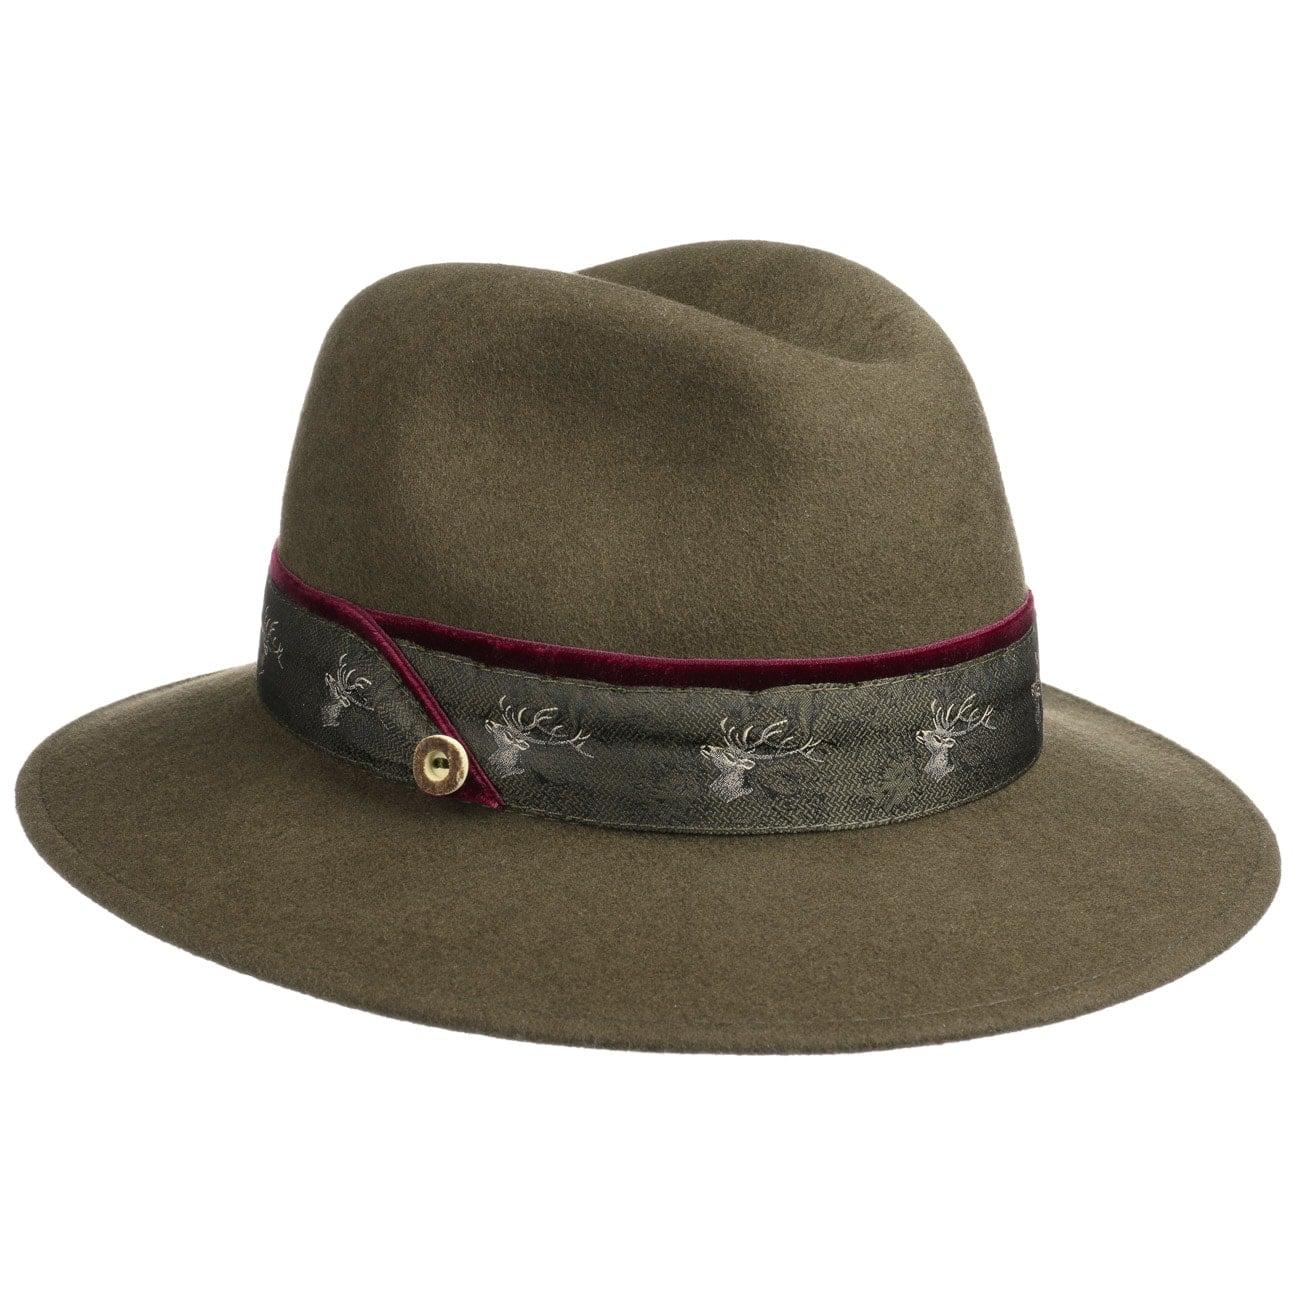 Sombrero de Mujer Deertrim by Lodenhut Manufaktur